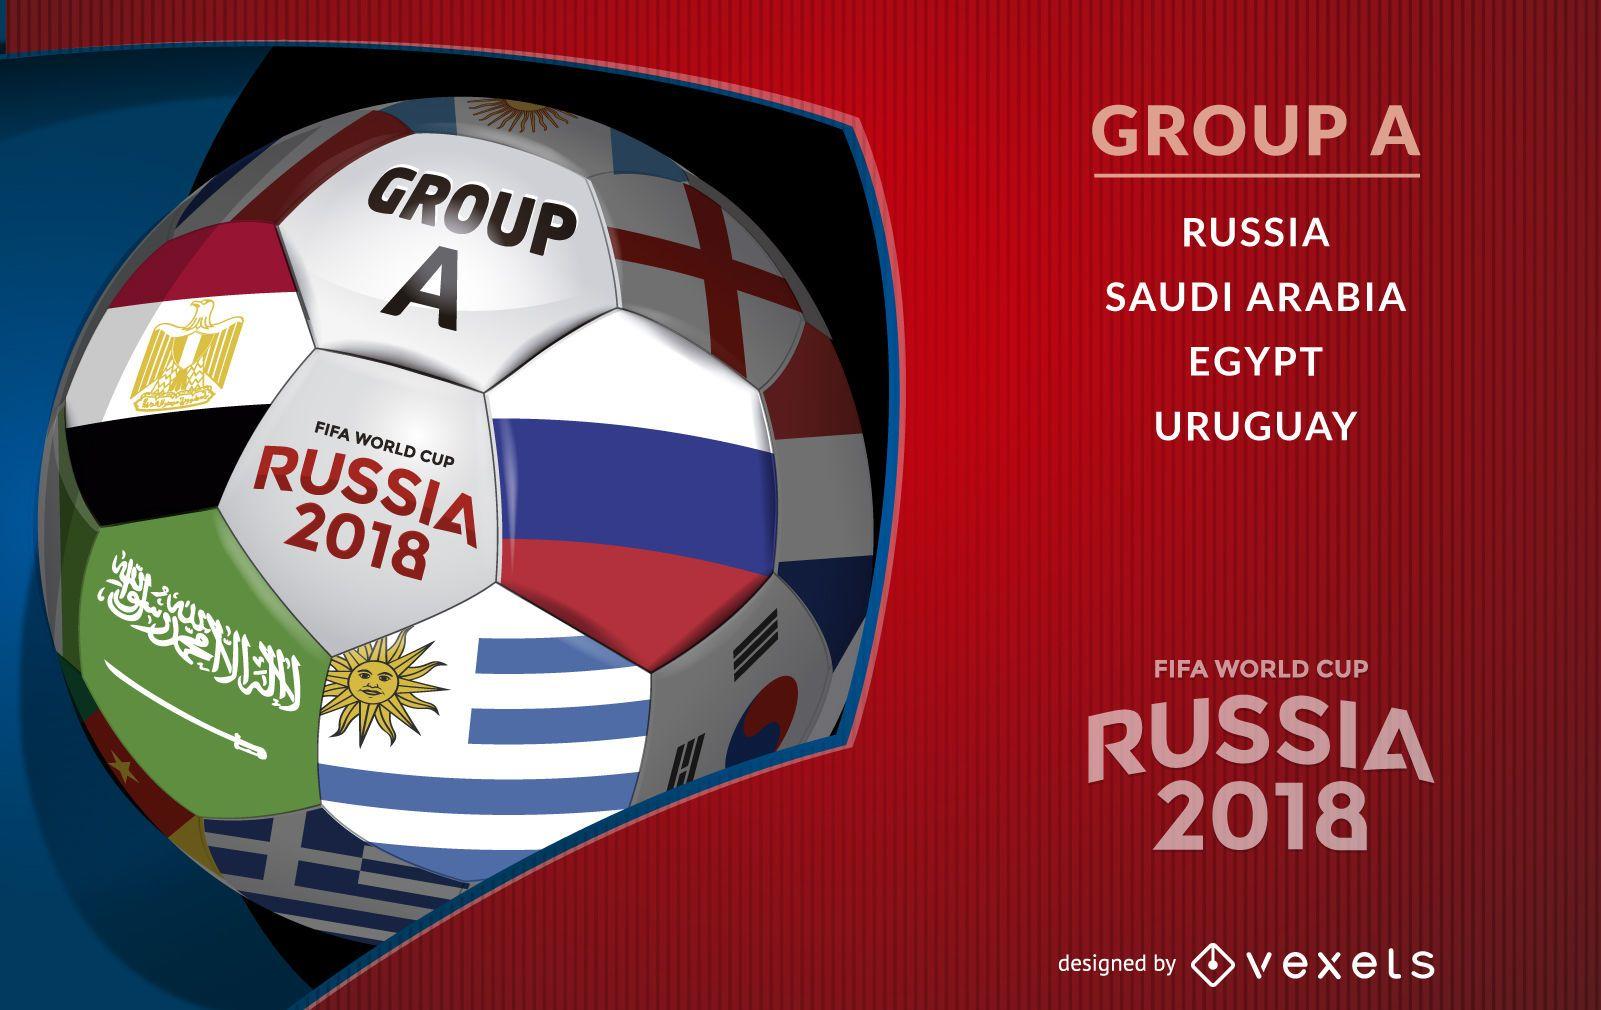 Good Football Ball World Cup 2018 - 699a43a92694740a093d2e1423c50e59-russia-2018-ball-with-group-a  Pic_249740 .jpg